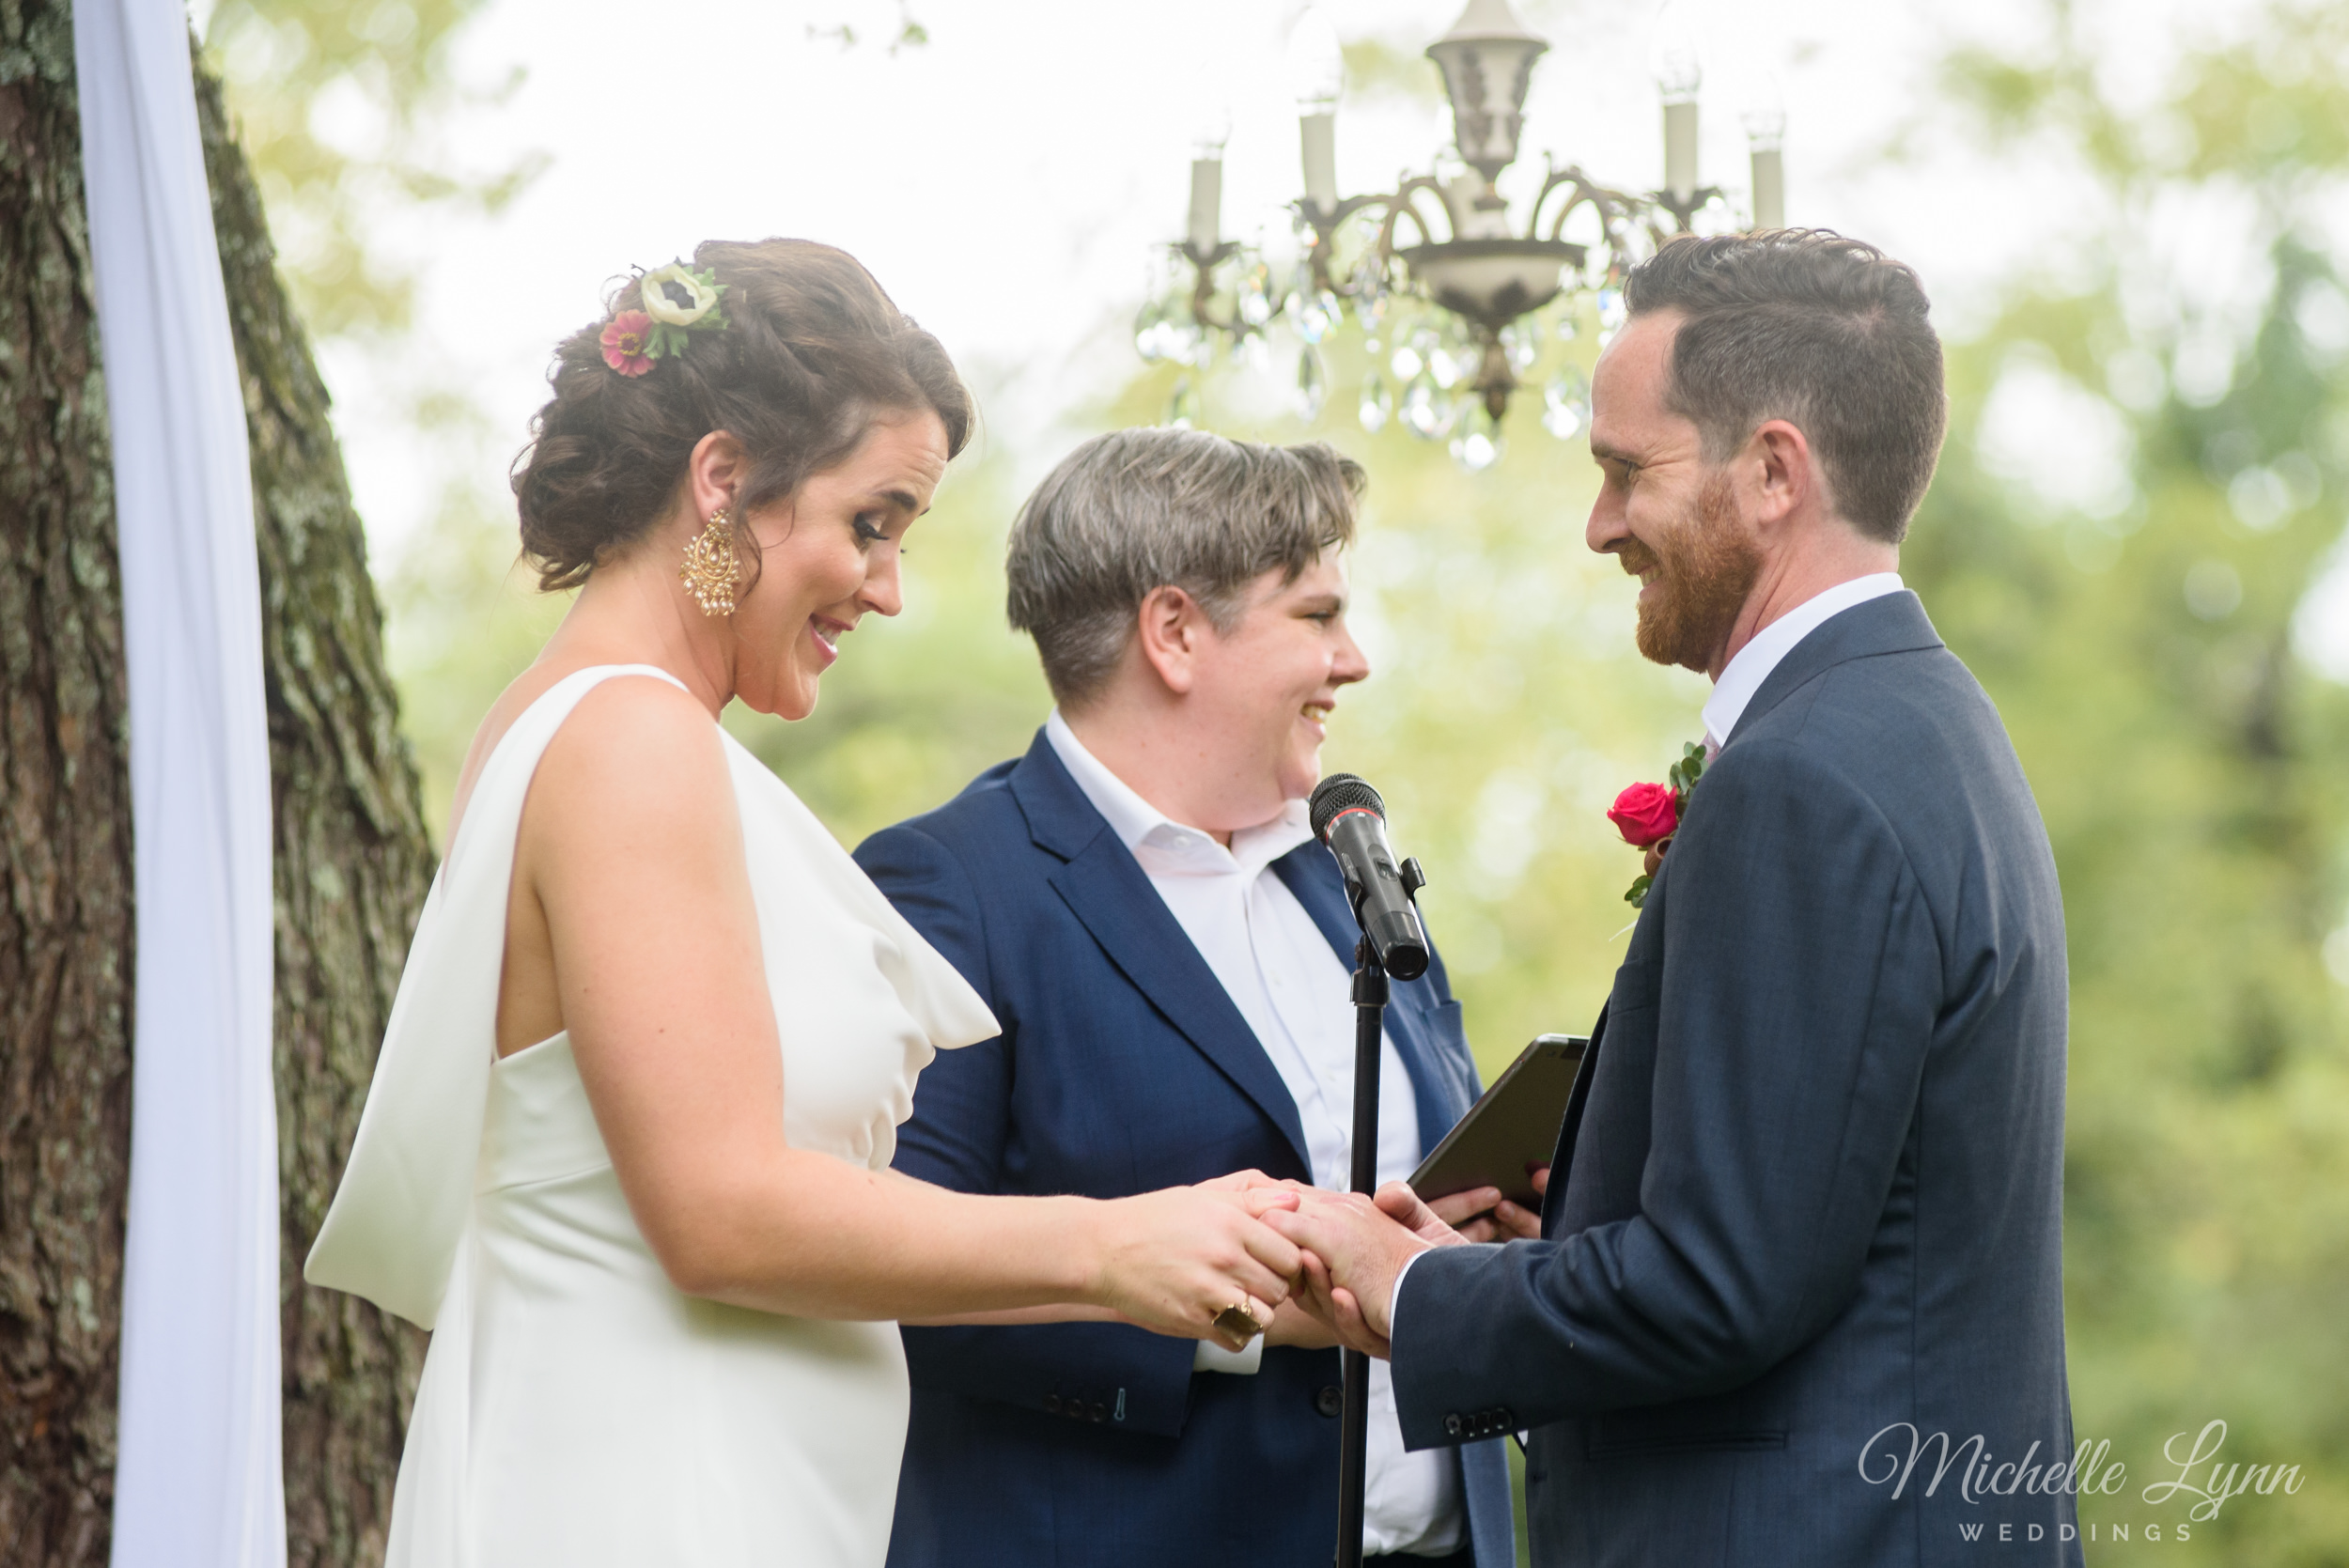 mlw-unionville-vineyards-nj-wedding-photography-43.jpg